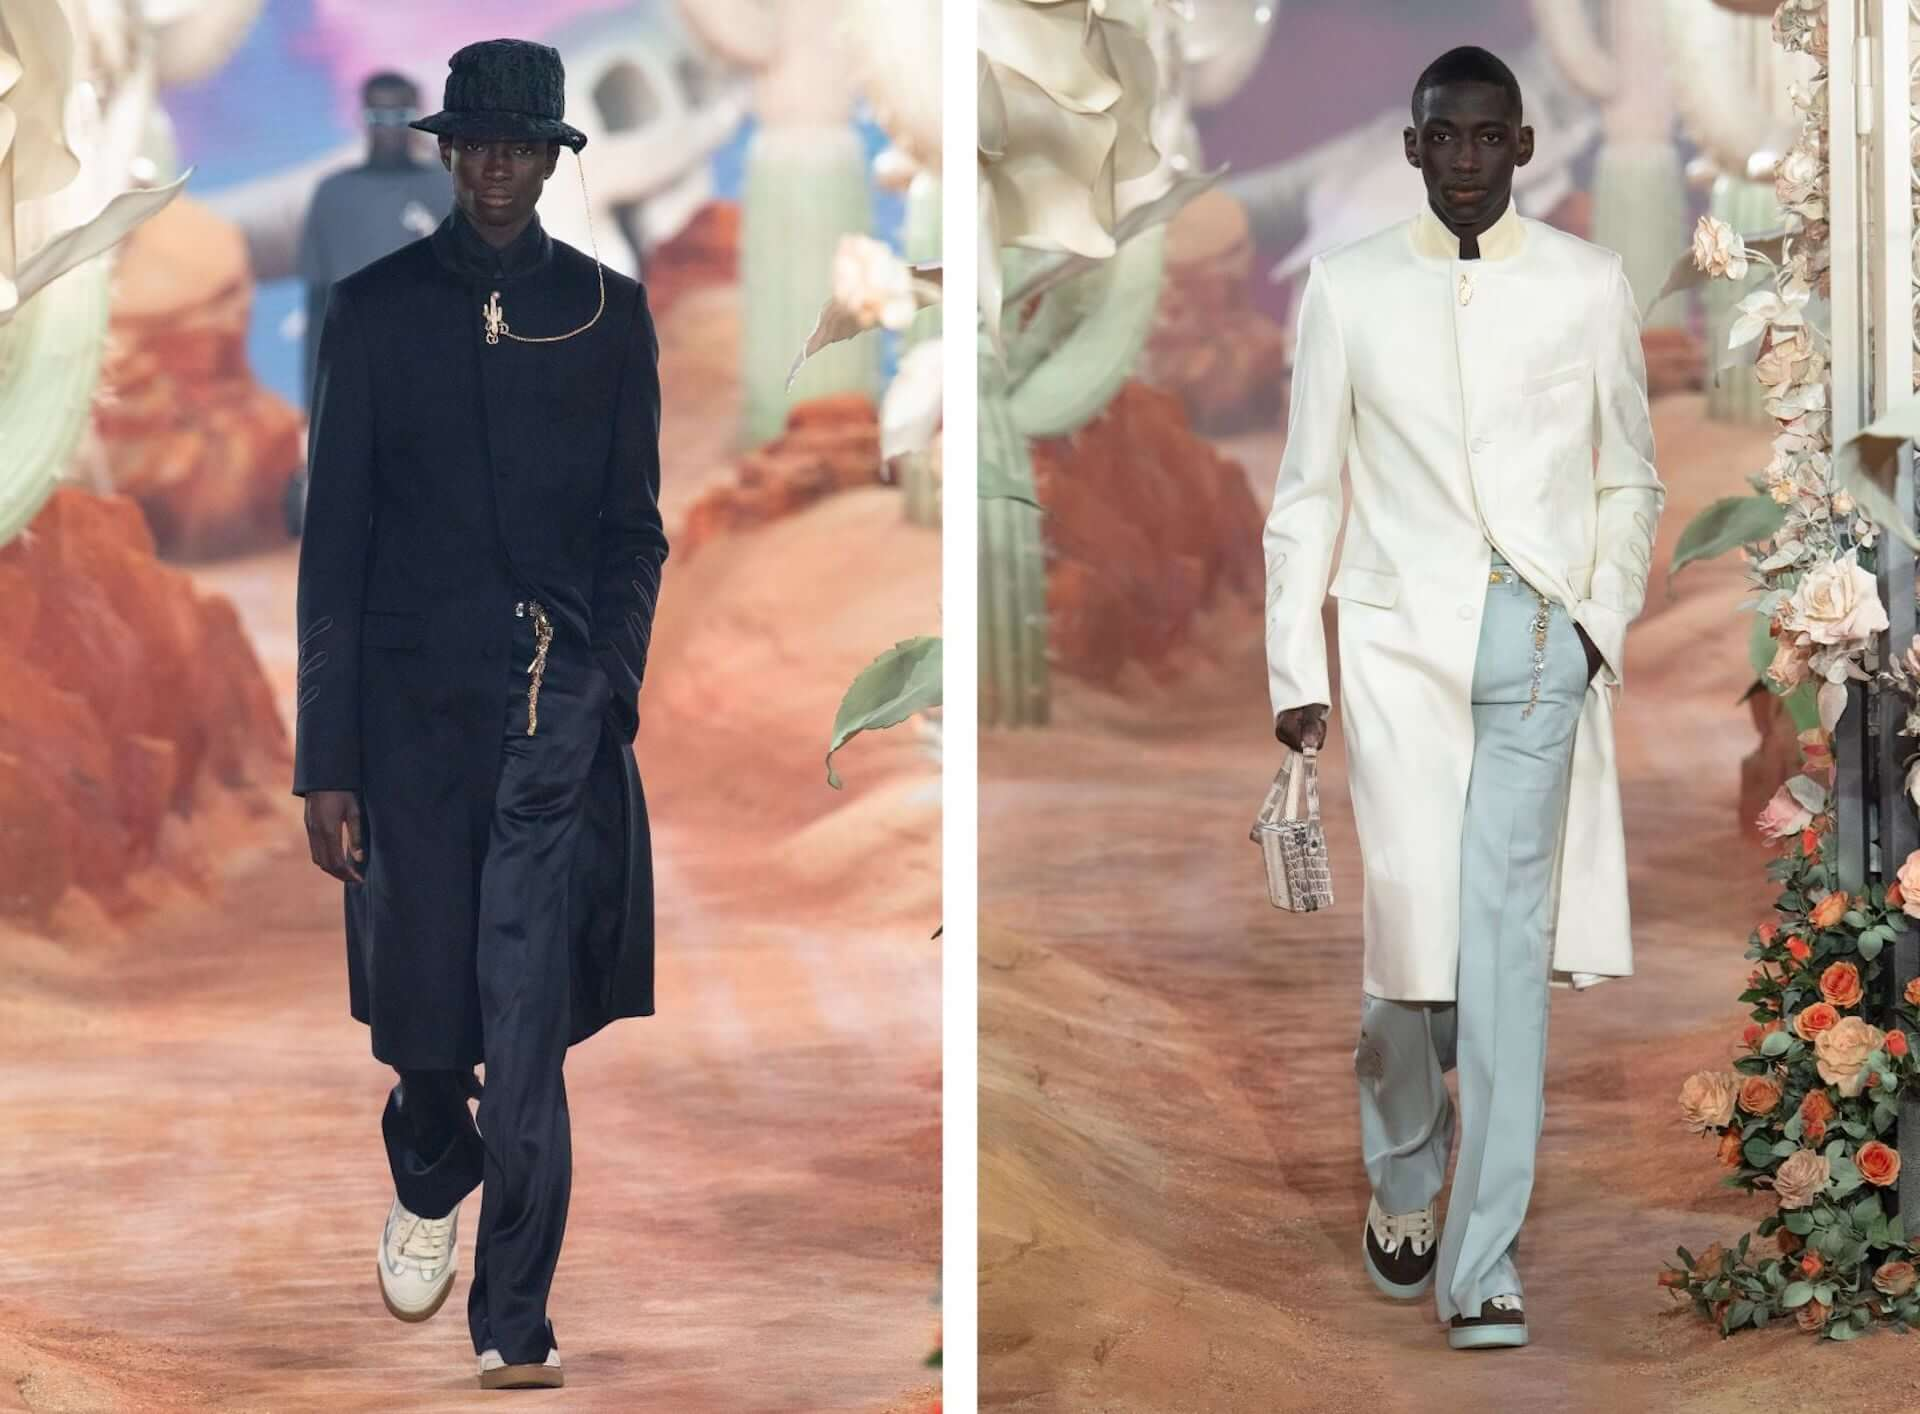 DiorがTravis Scottとコラボレーションし、サマー2022メンズ コレクションショーを開催!